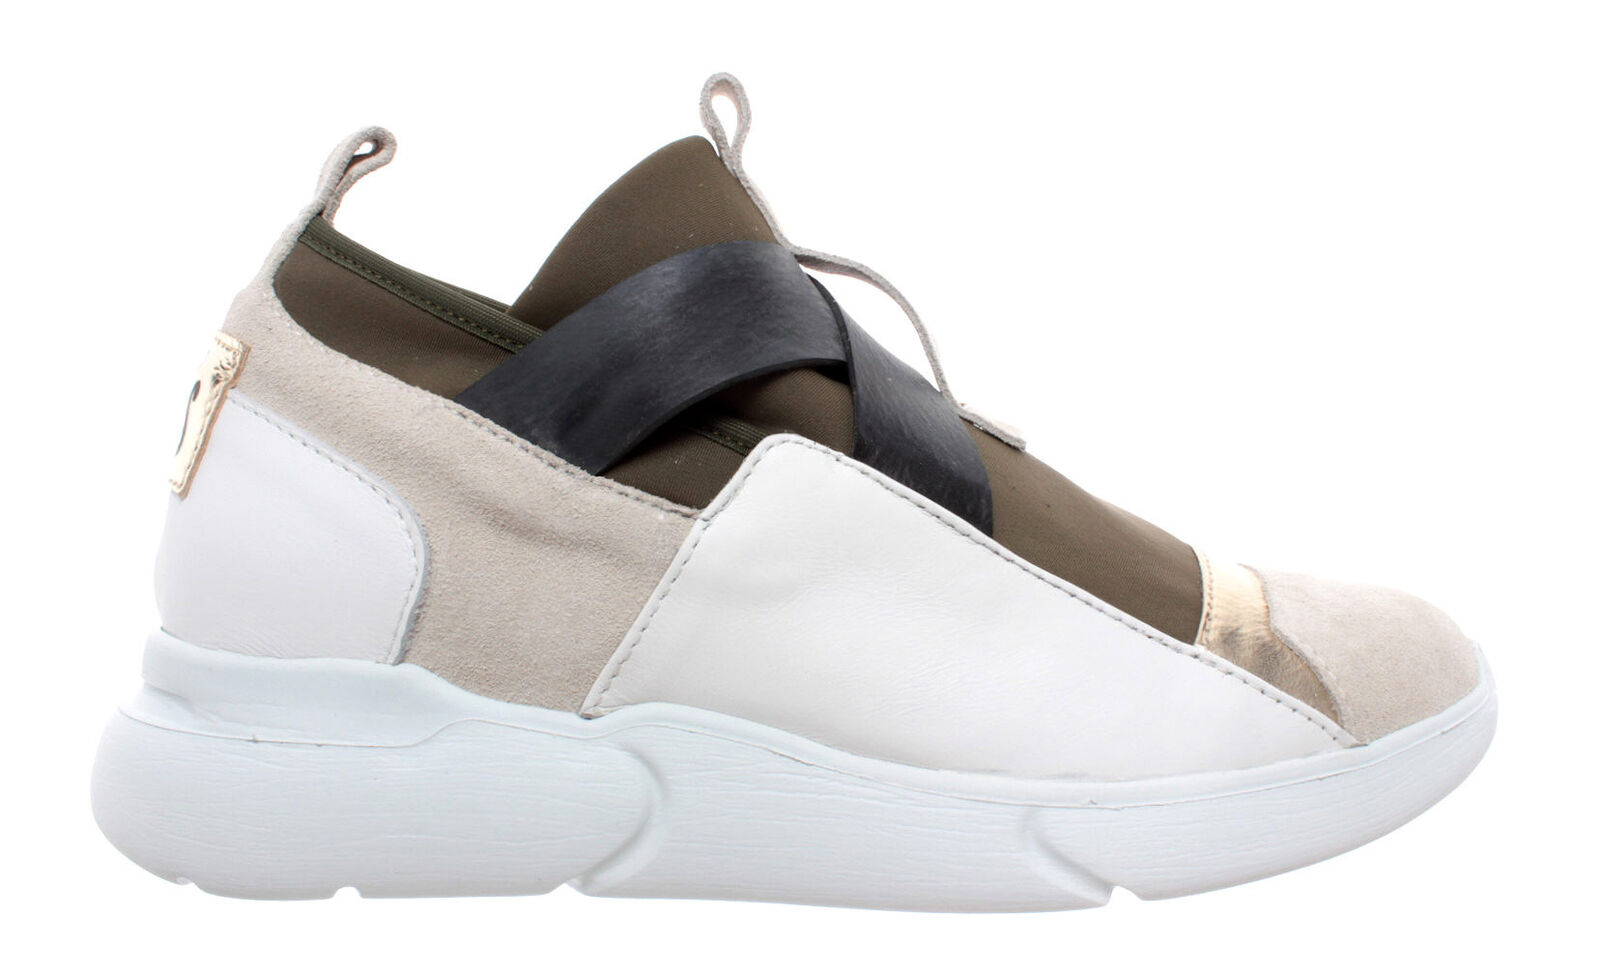 Women's shoes iXOS Sneakers Multicolor Beige gold Kaki Leather Slip On New